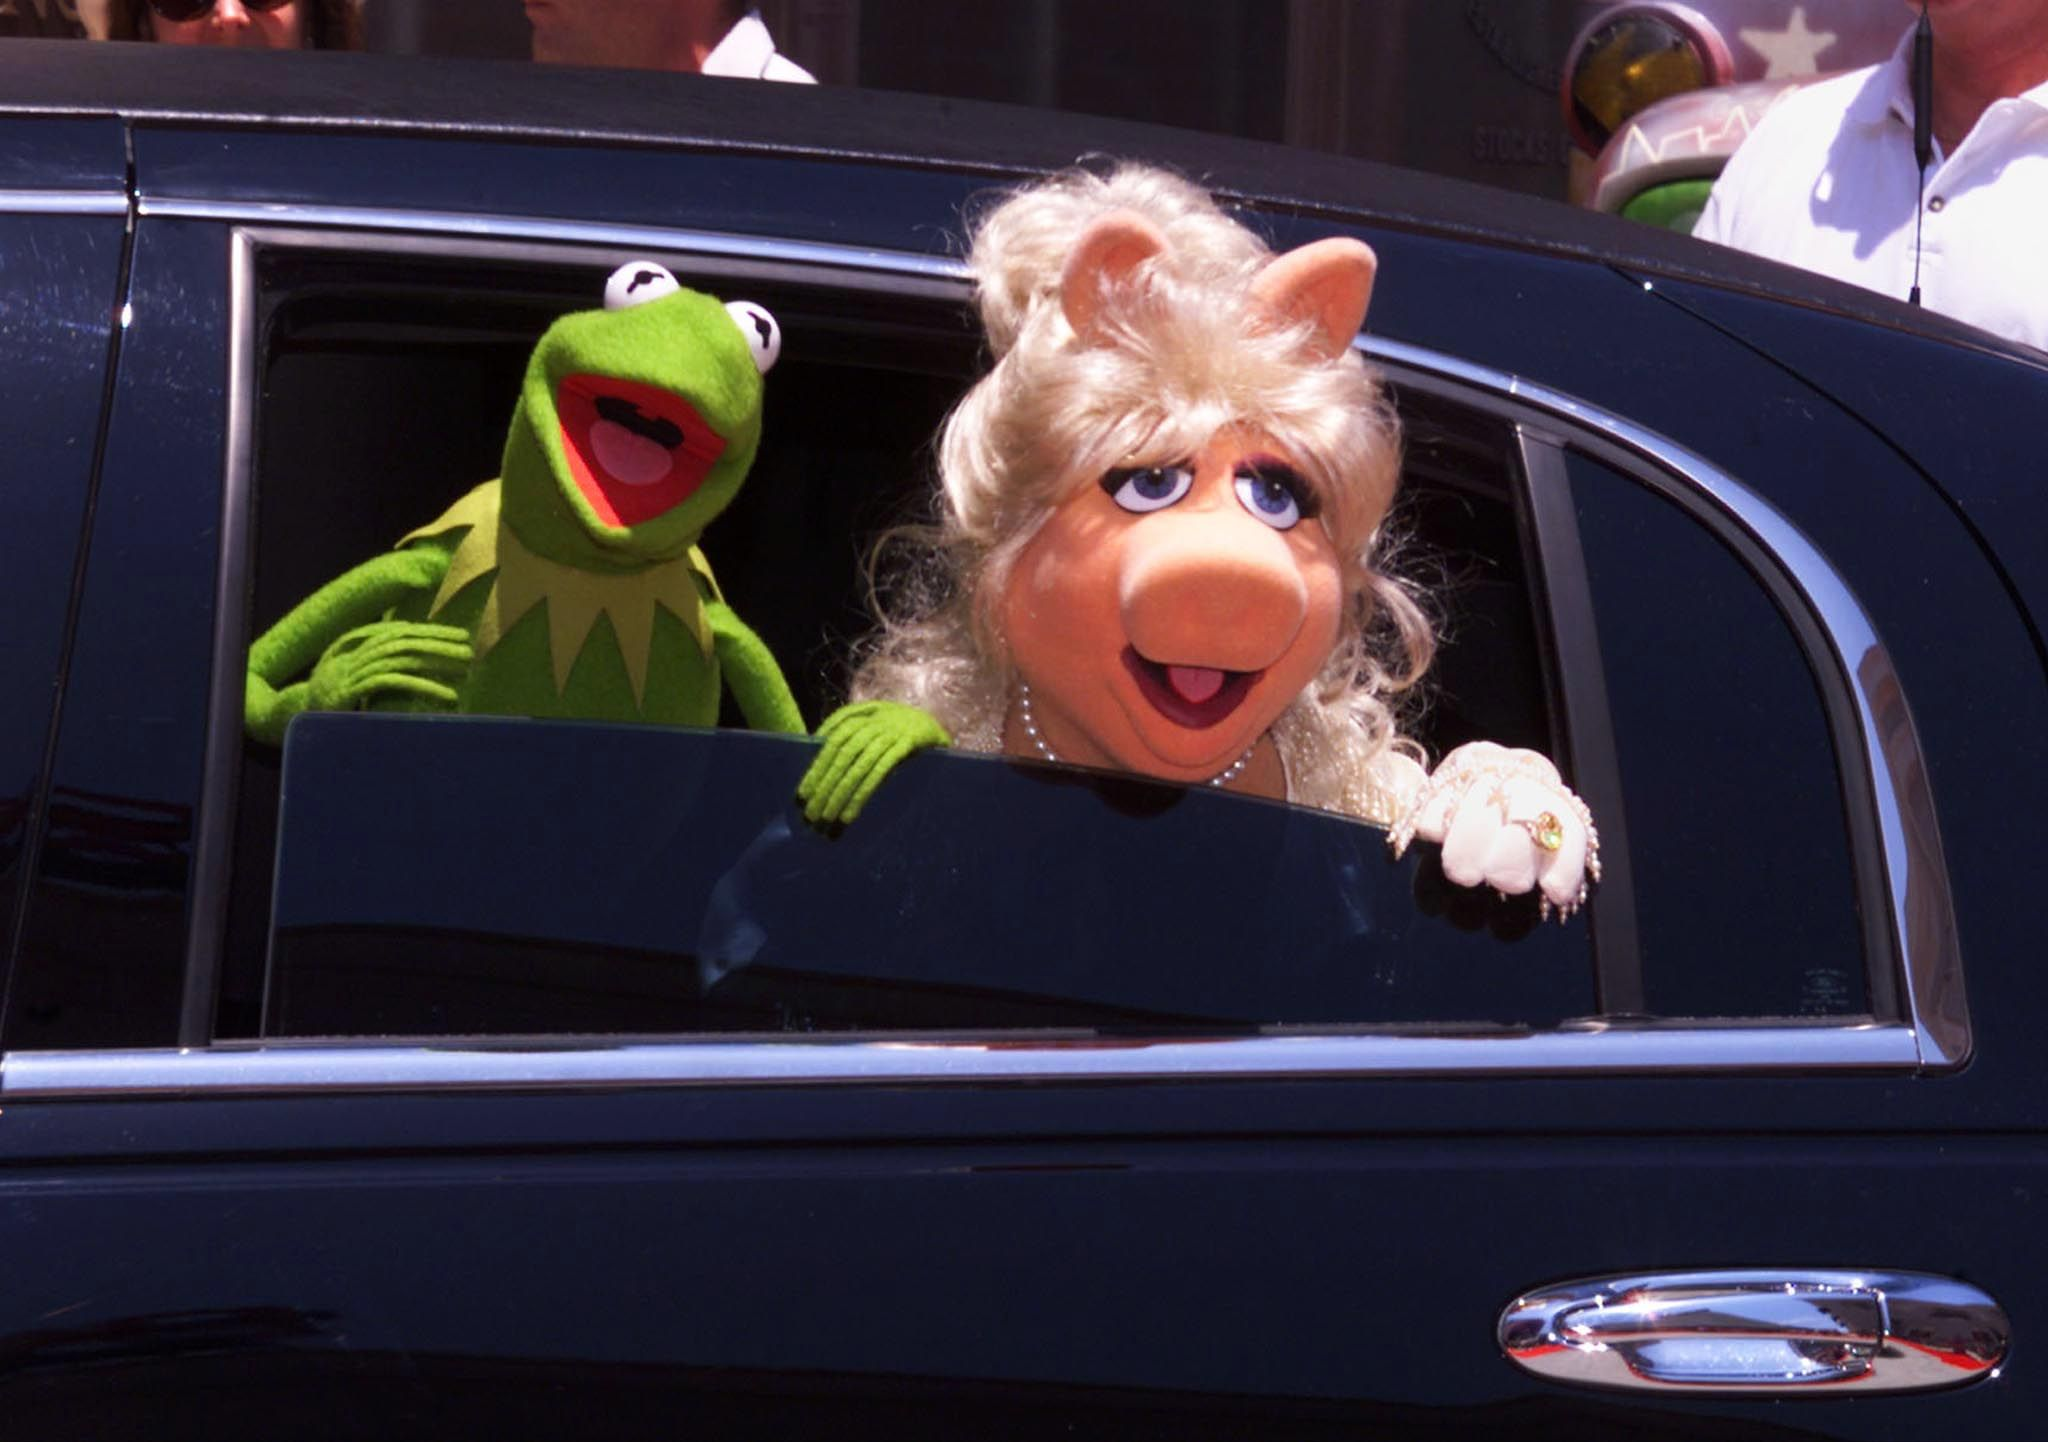 Piggy Kermit